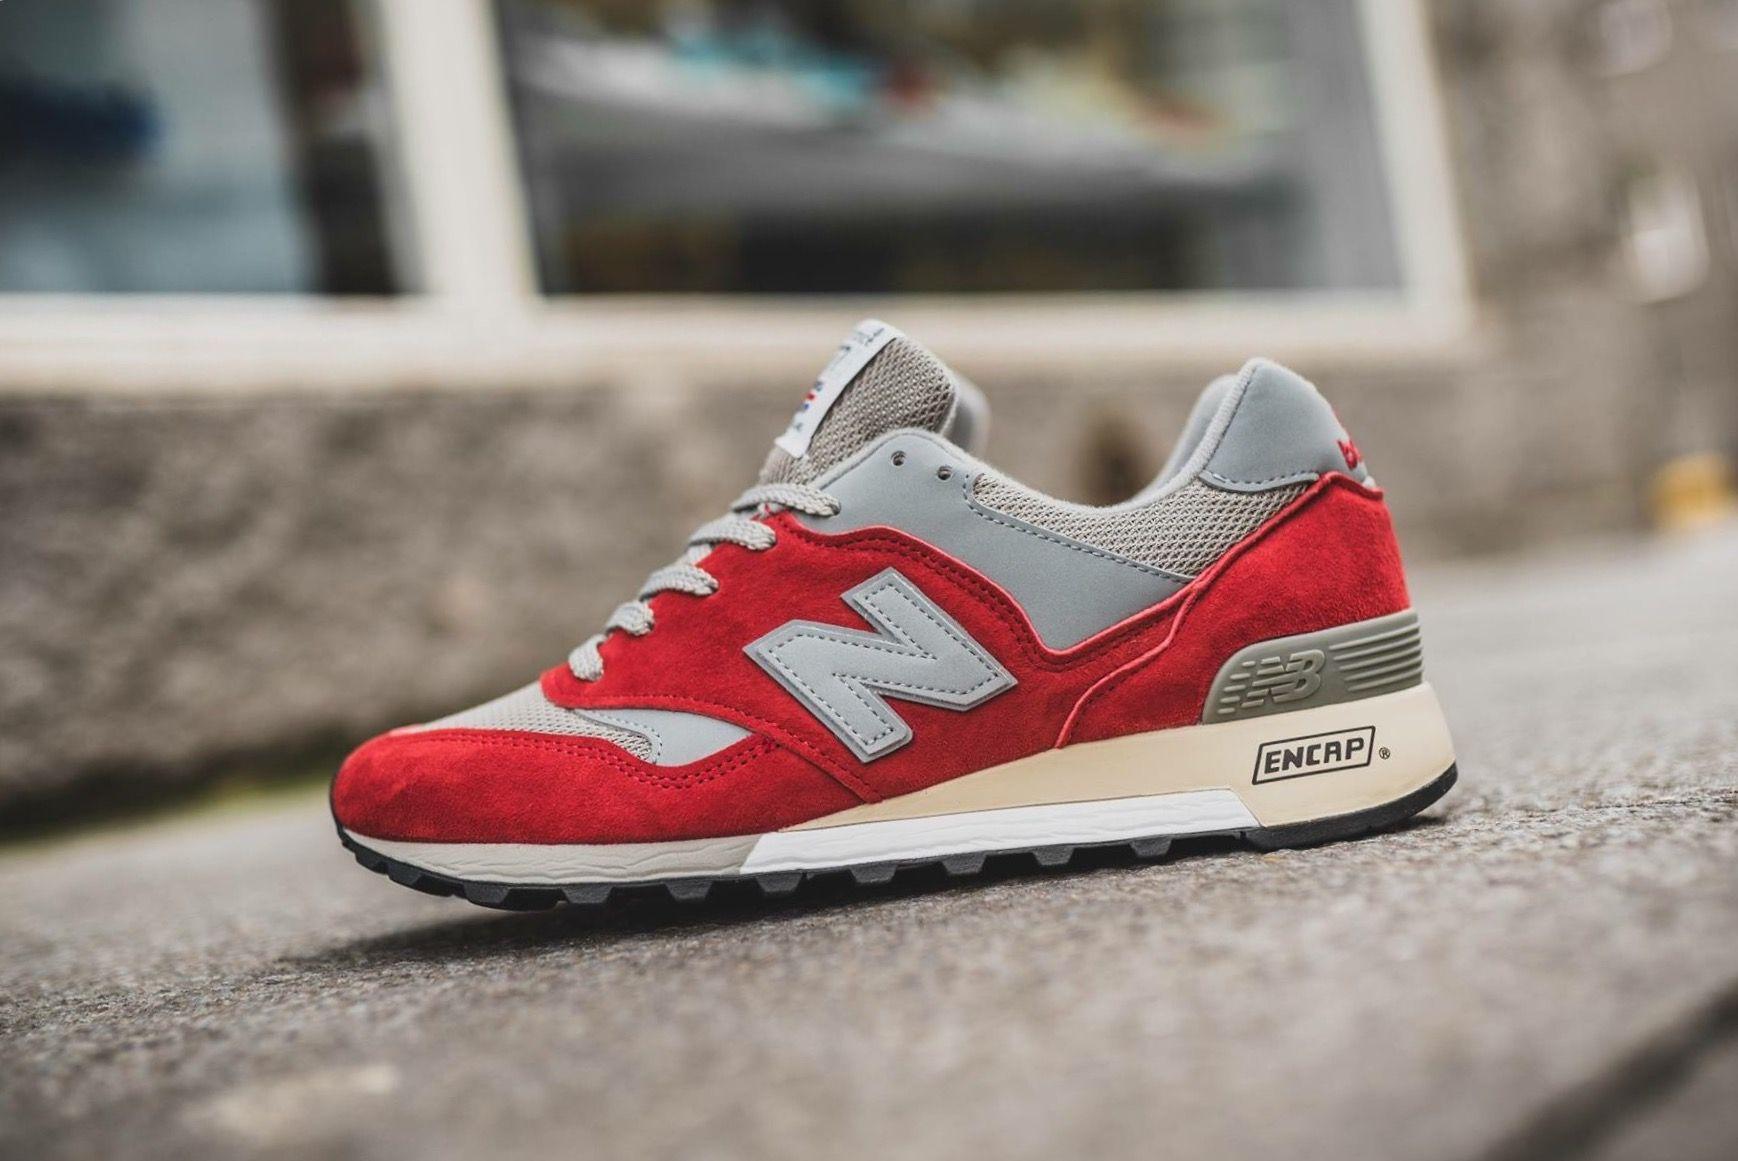 New Balance 577 Red/Grey Sneakers men, New balance